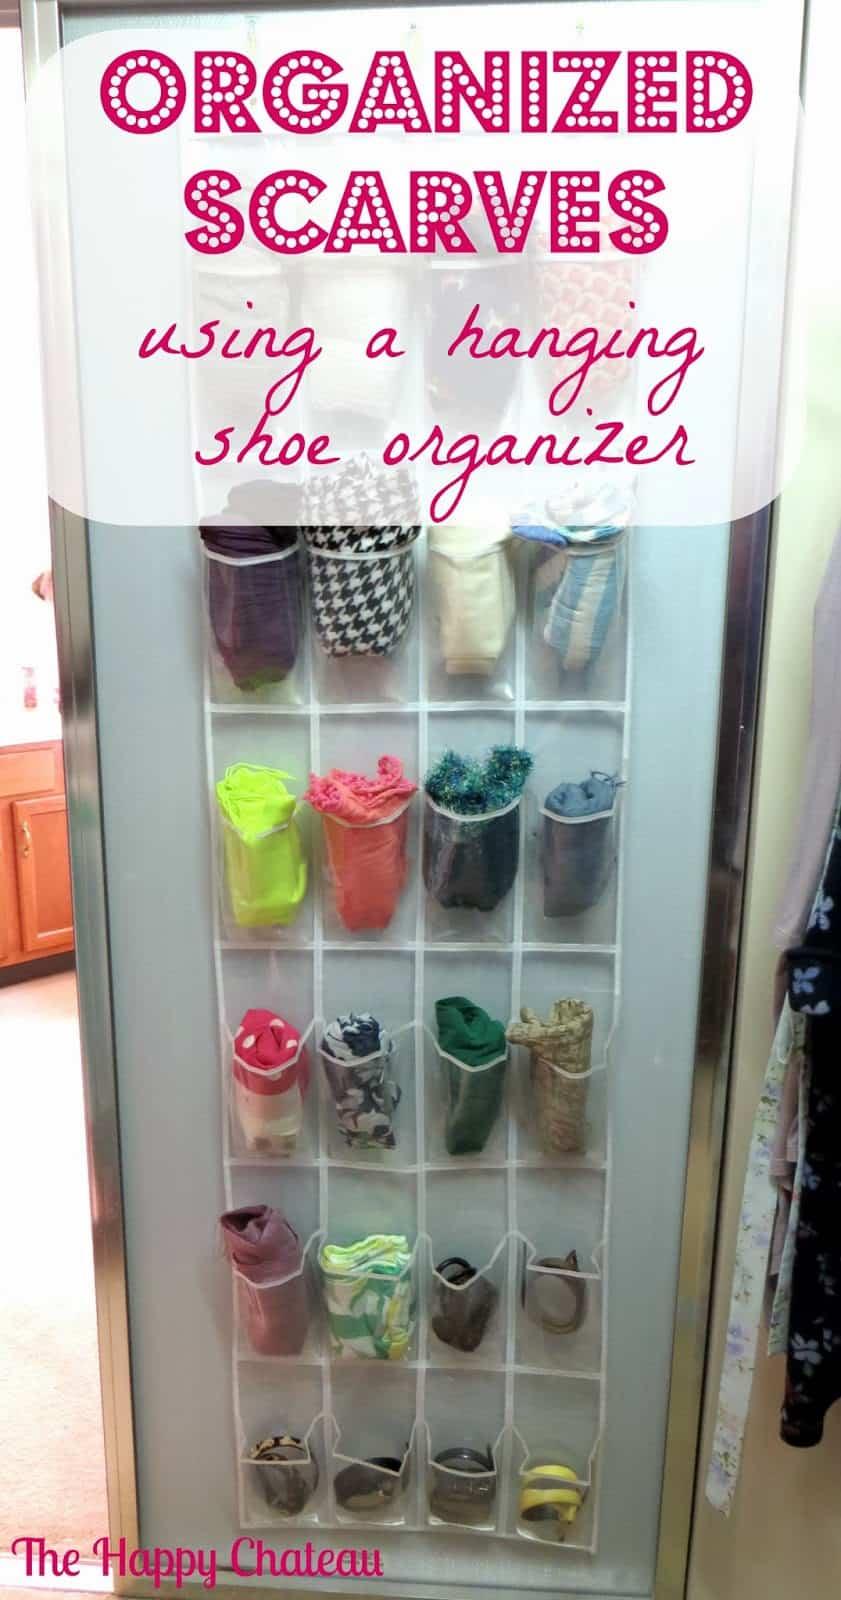 Get Organized with Over the Door Shoe Organizers